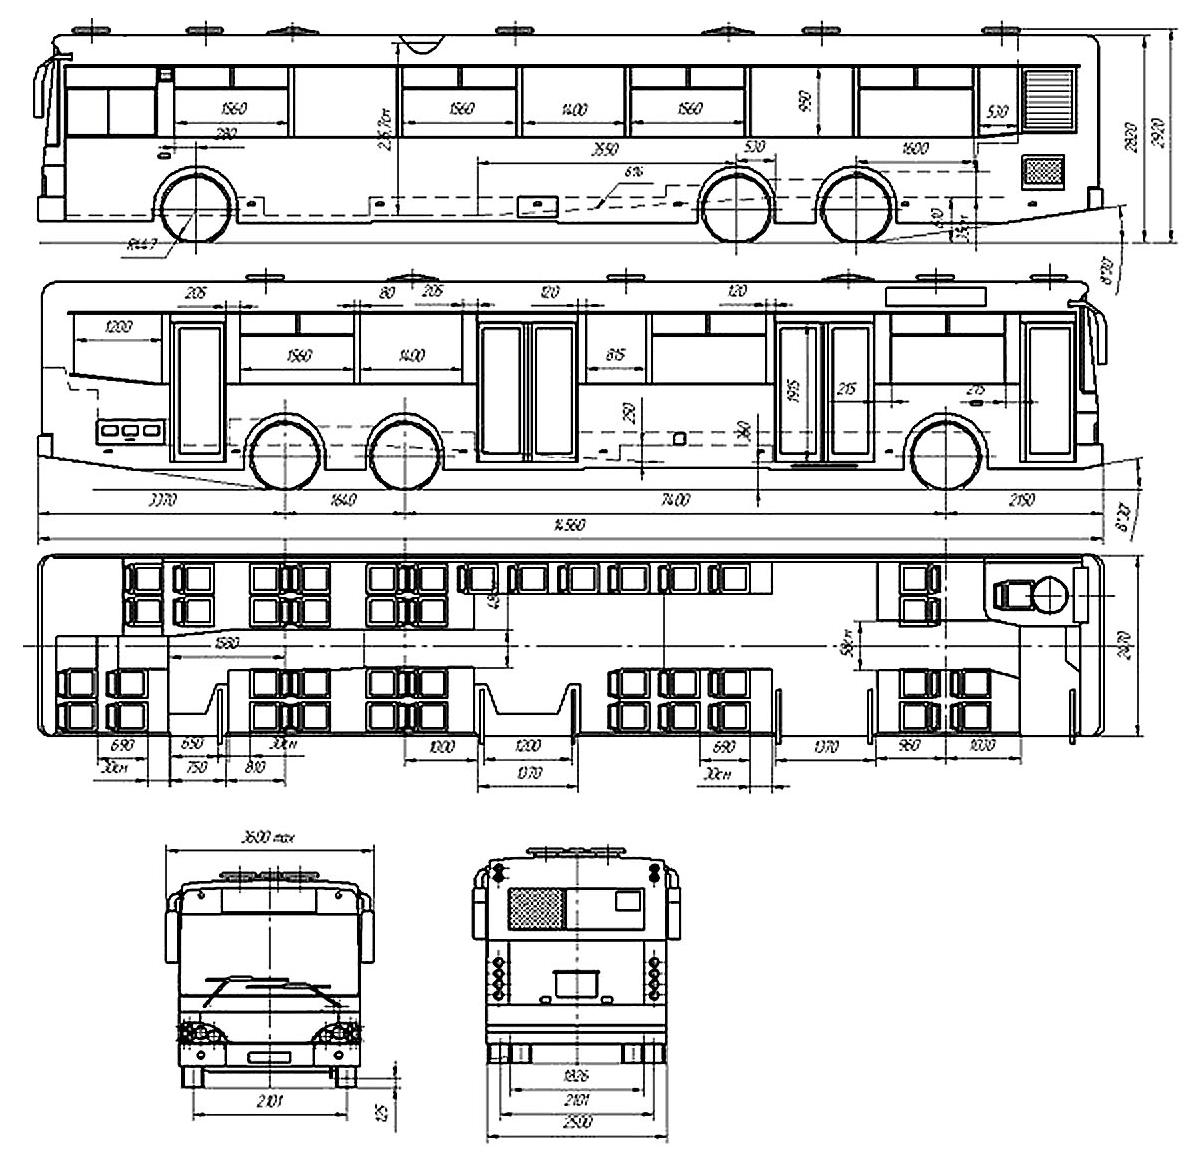 Bohdan A-231 (E-2) blueprint